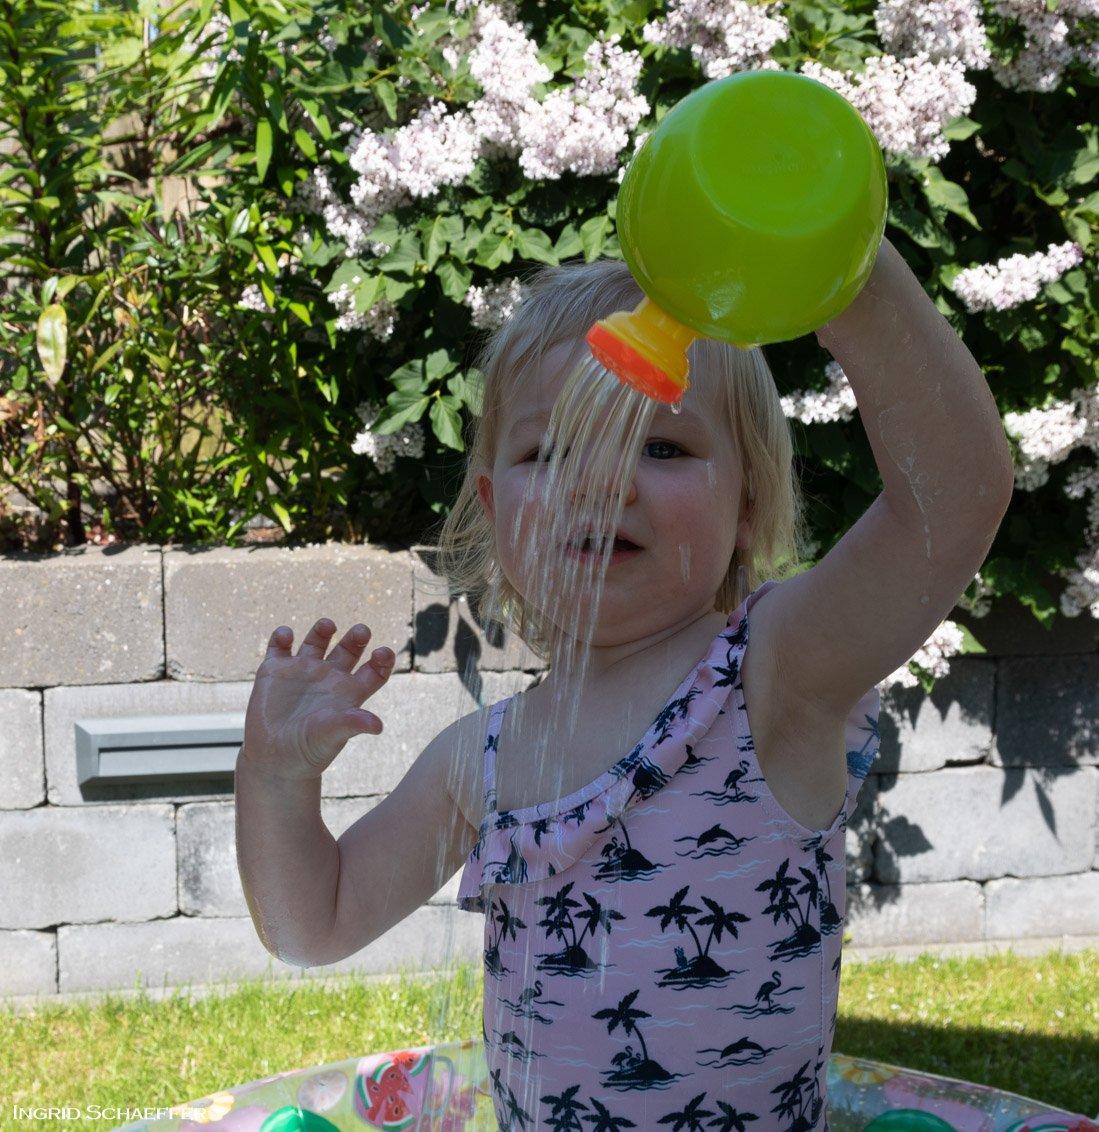 zomergevoel Ingrid (2)